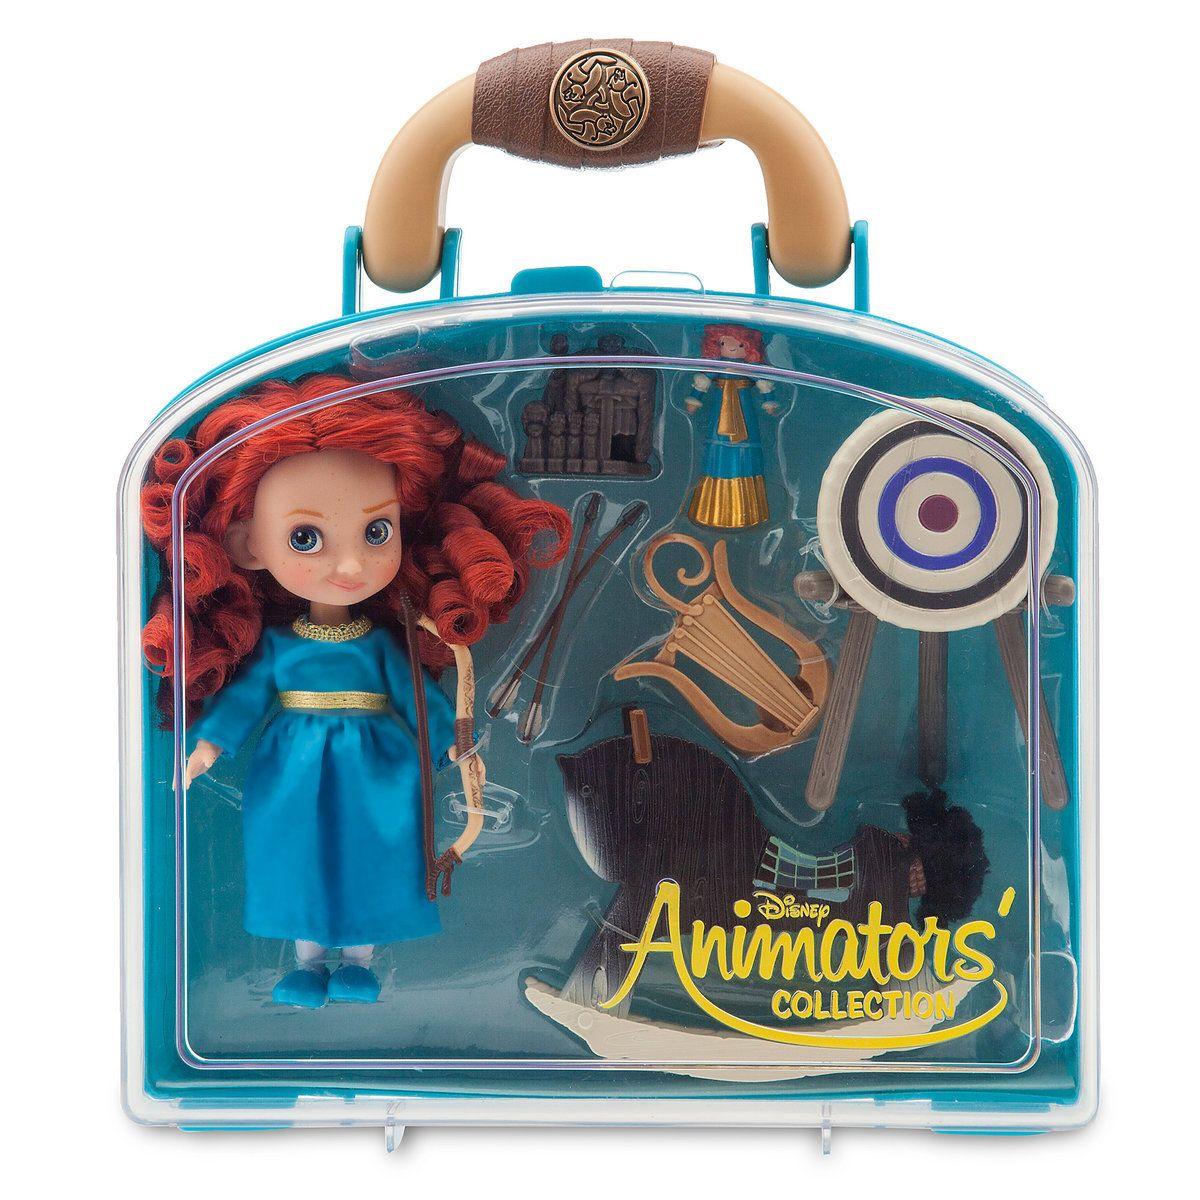 c8a8c8c453a Disney Animators  Collection Merida Mini Doll Play Set - 5 ...